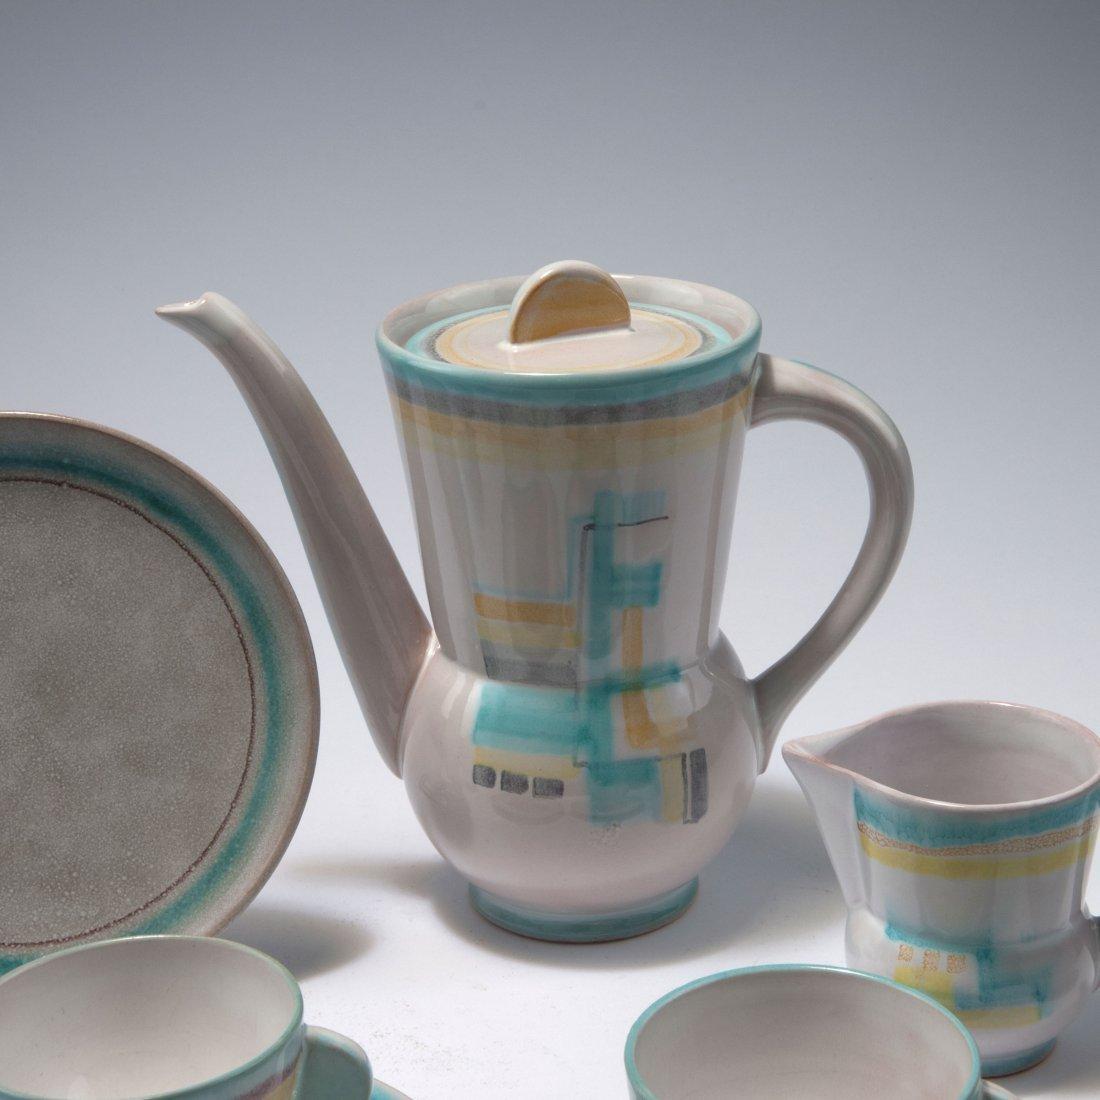 'Cologne' coffee set, c1928 - 2